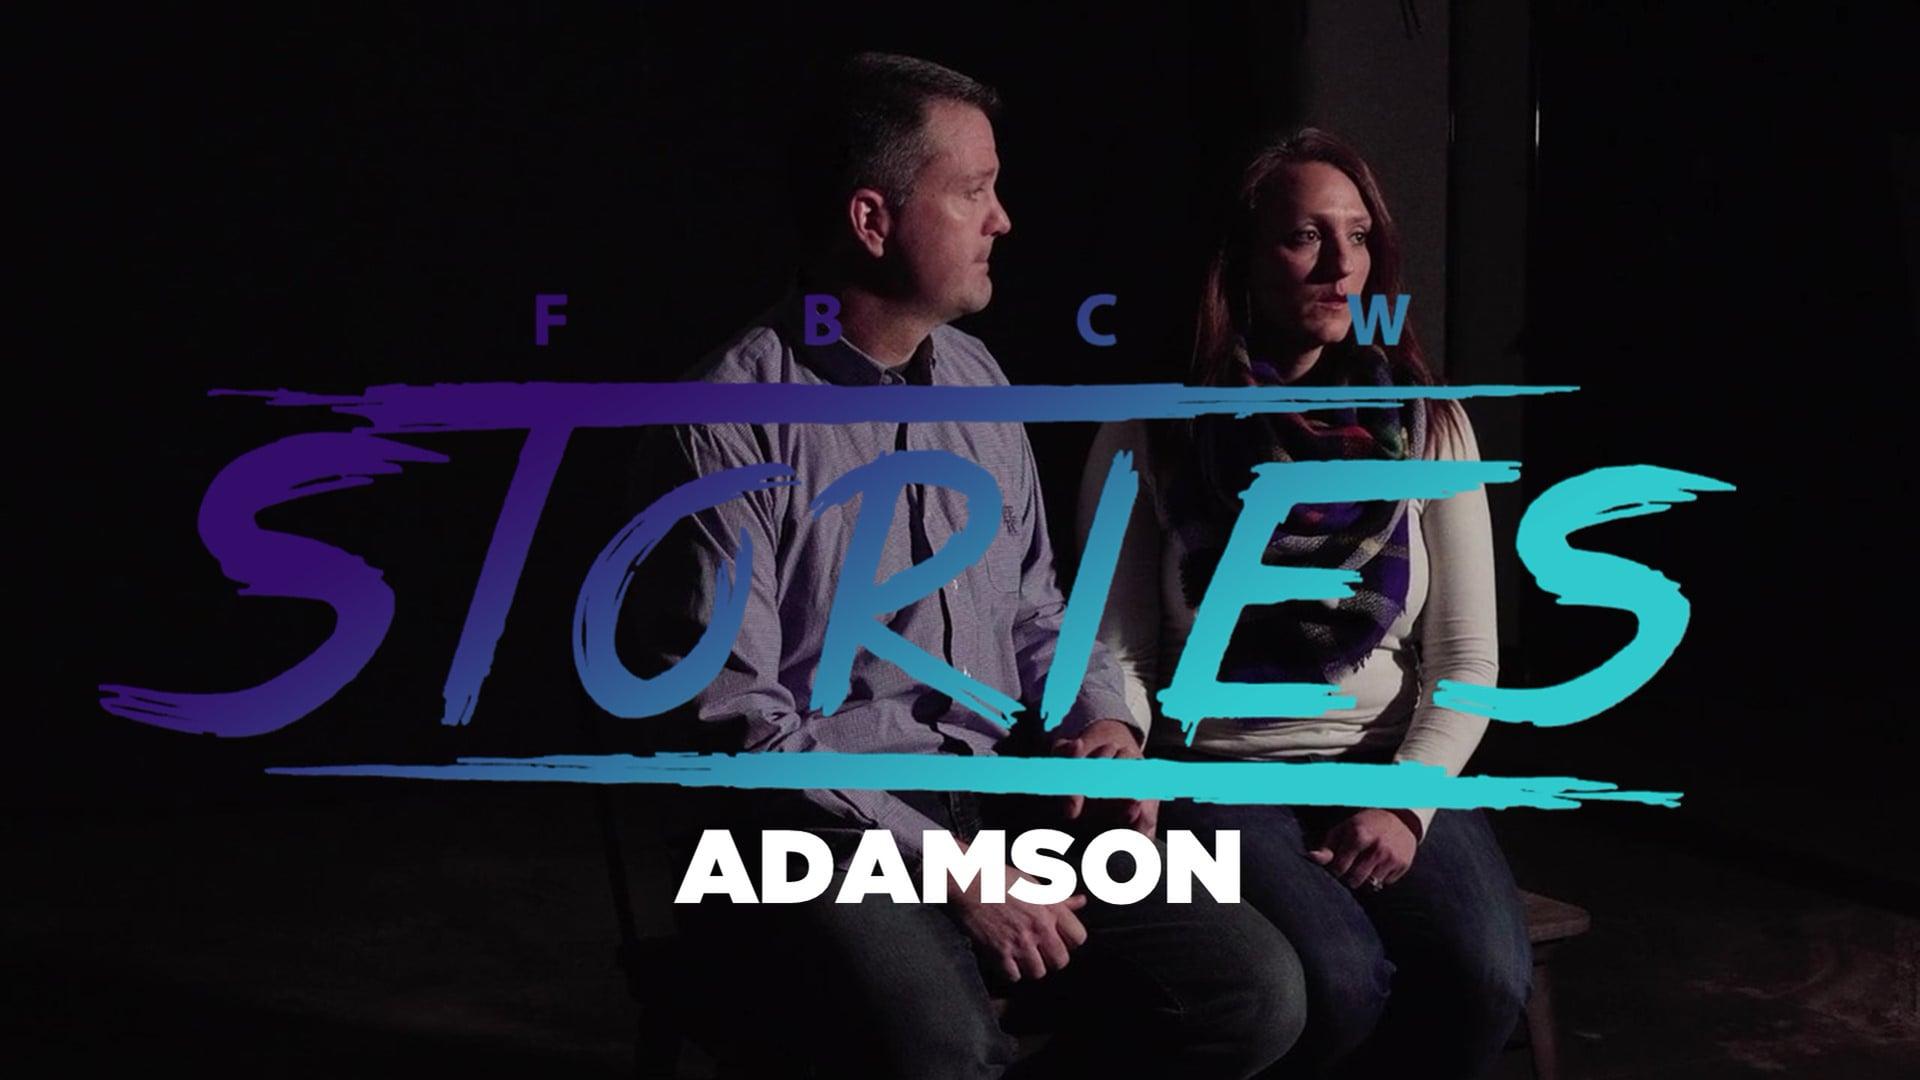 FBCW Stories Adamson